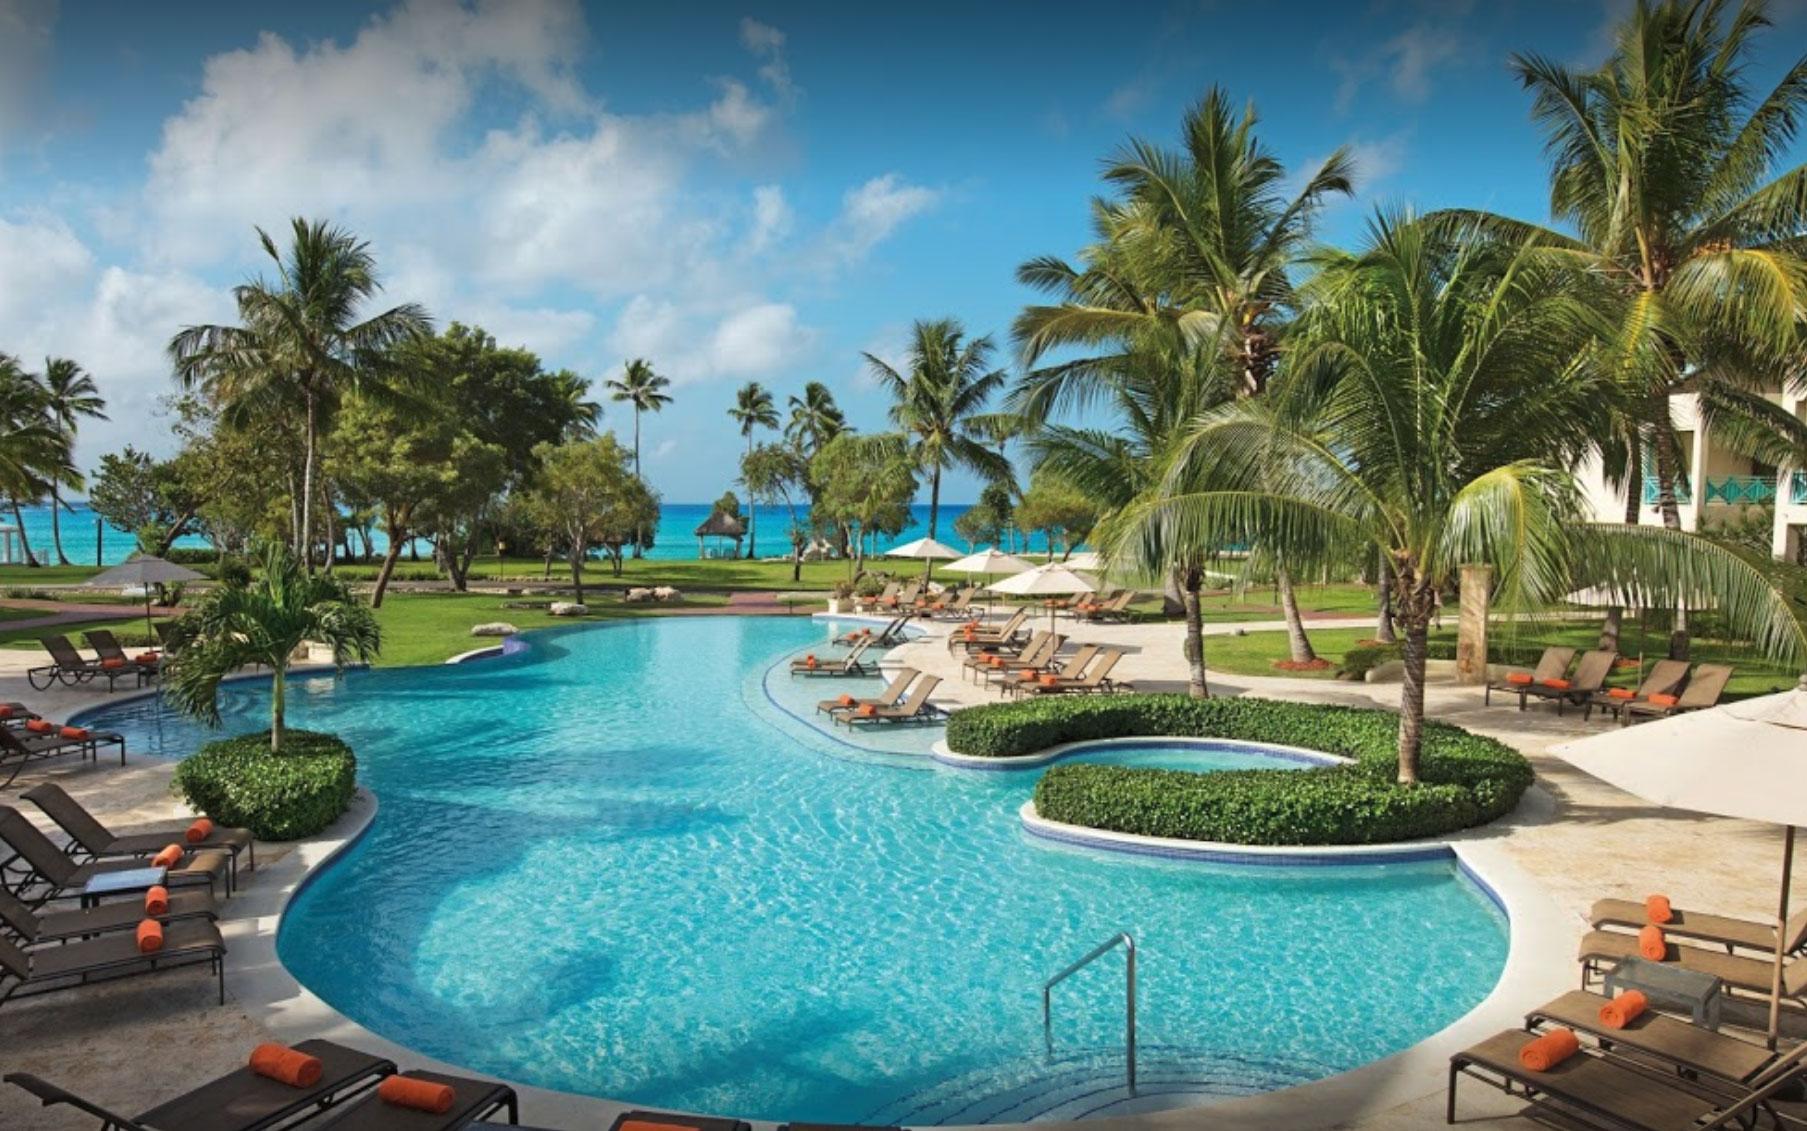 Hilton La Romana an Allinclusive Adult Resort